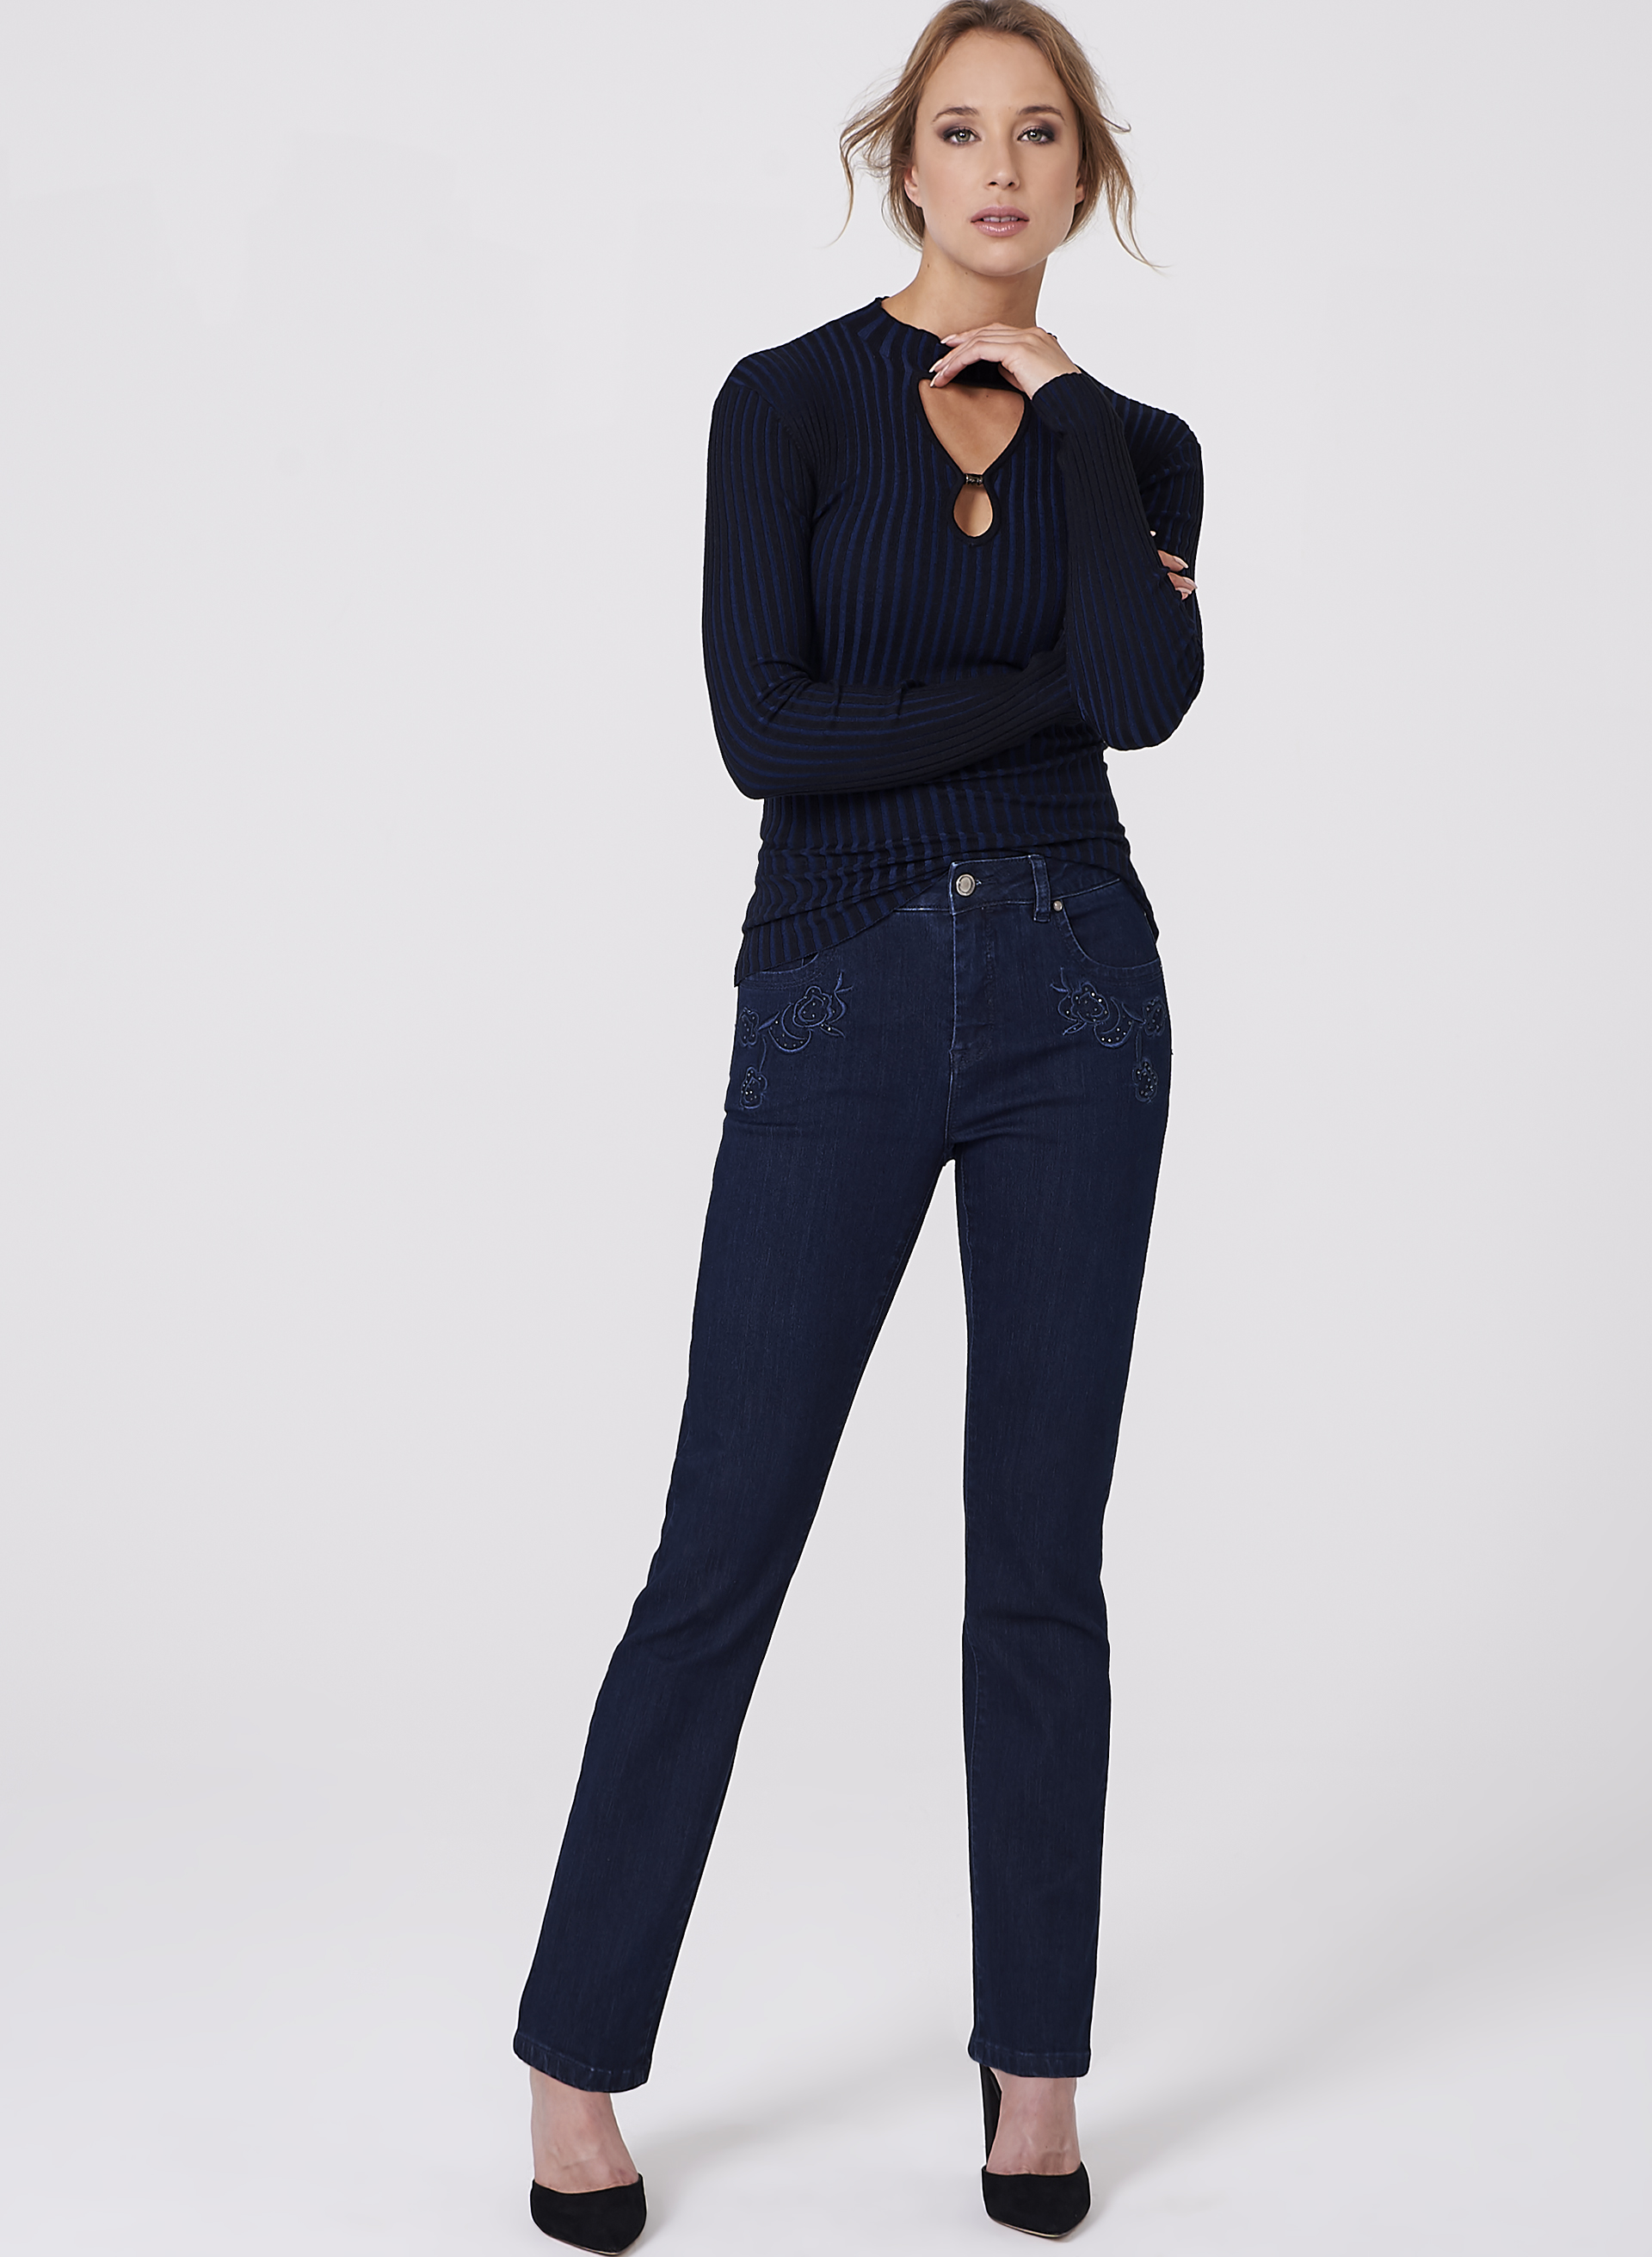 Simon chang clothing online